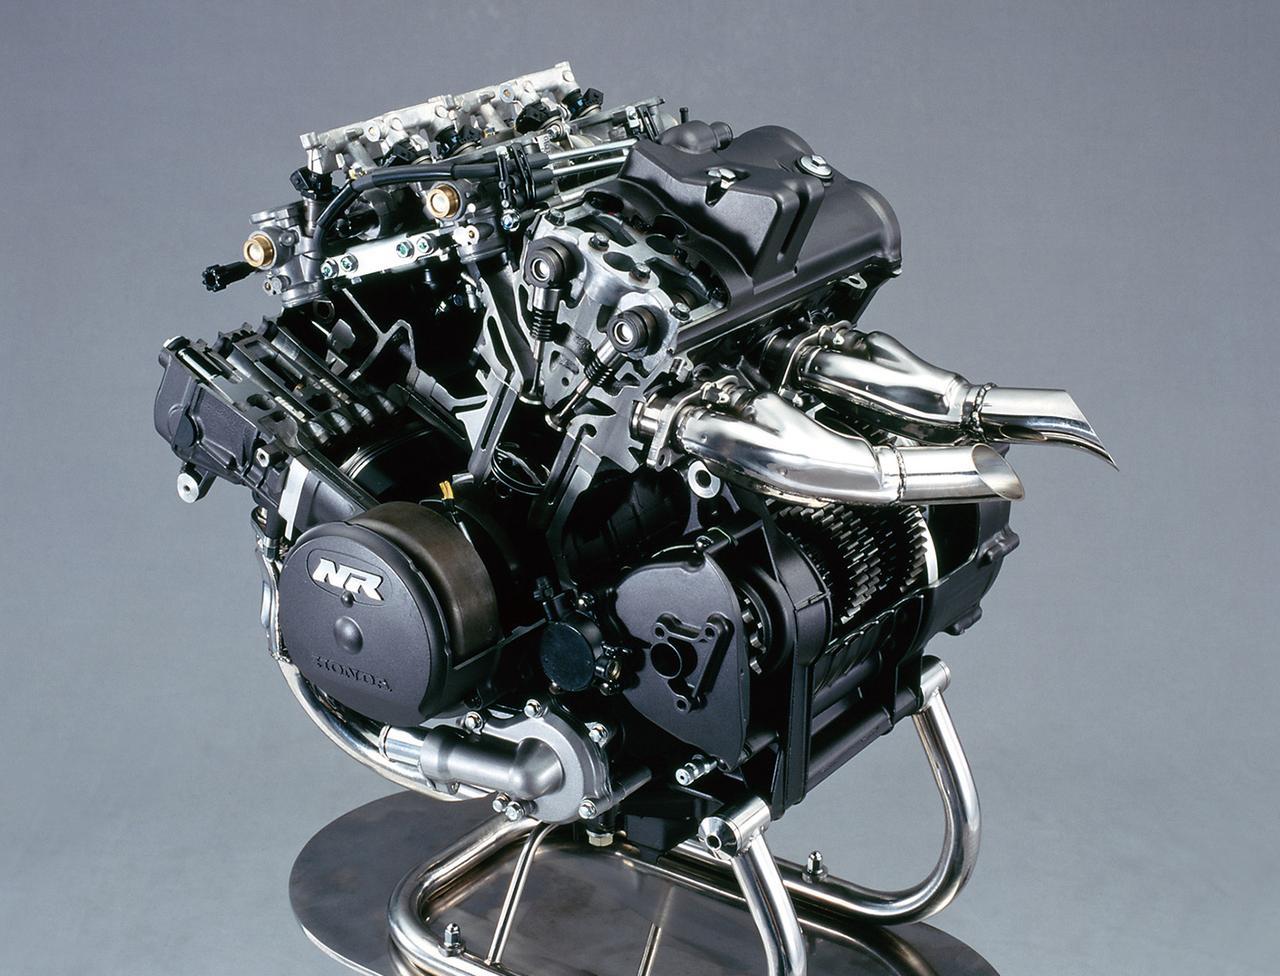 Images : 3番目の画像 - 「唯一無二の存在! 「楕円ピストン」V4エンジン搭載『HONDA NR』【名車図鑑】」のアルバム - webオートバイ